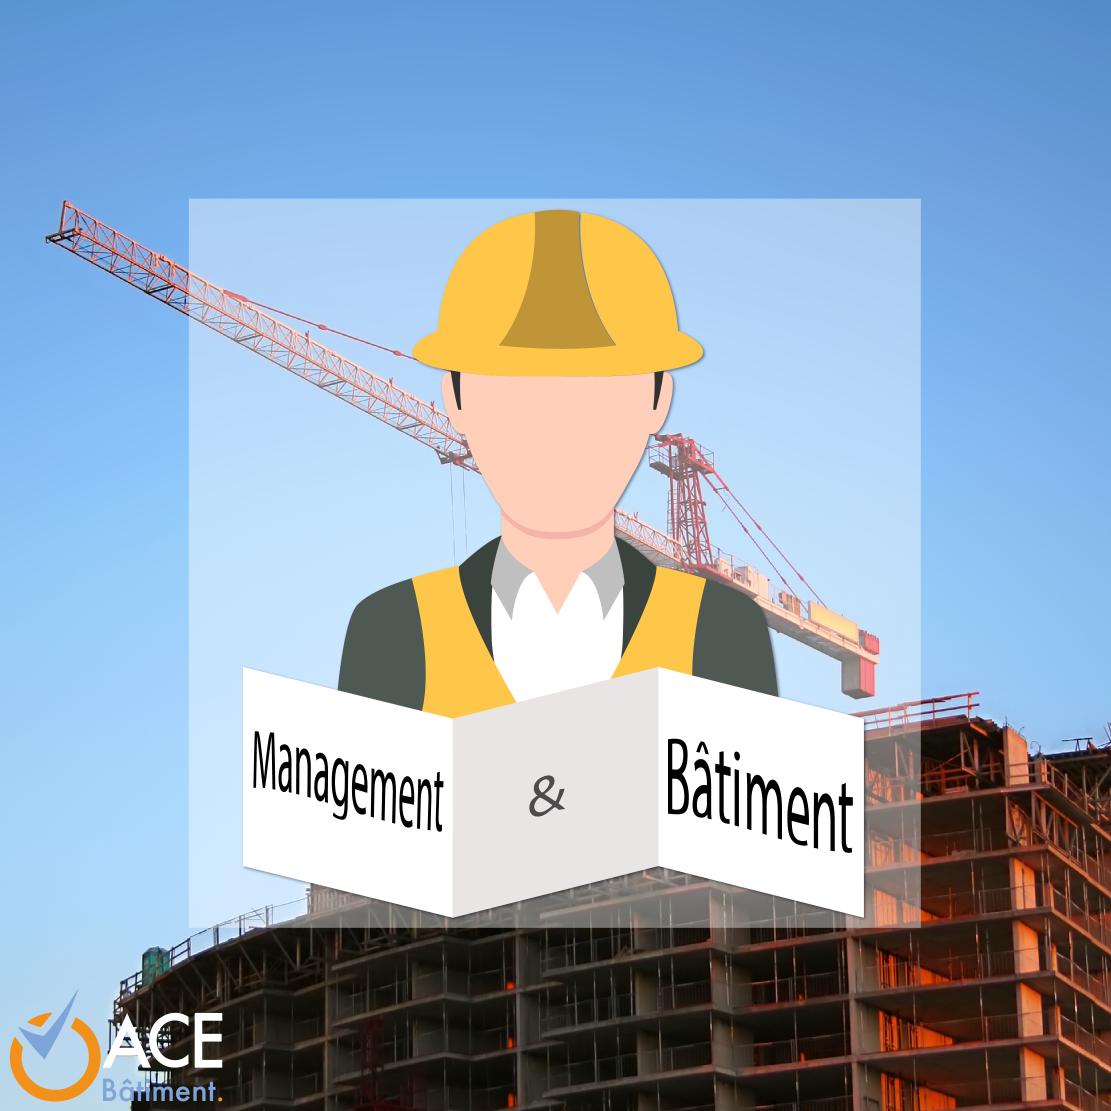 Manager, Management et Bâtiment